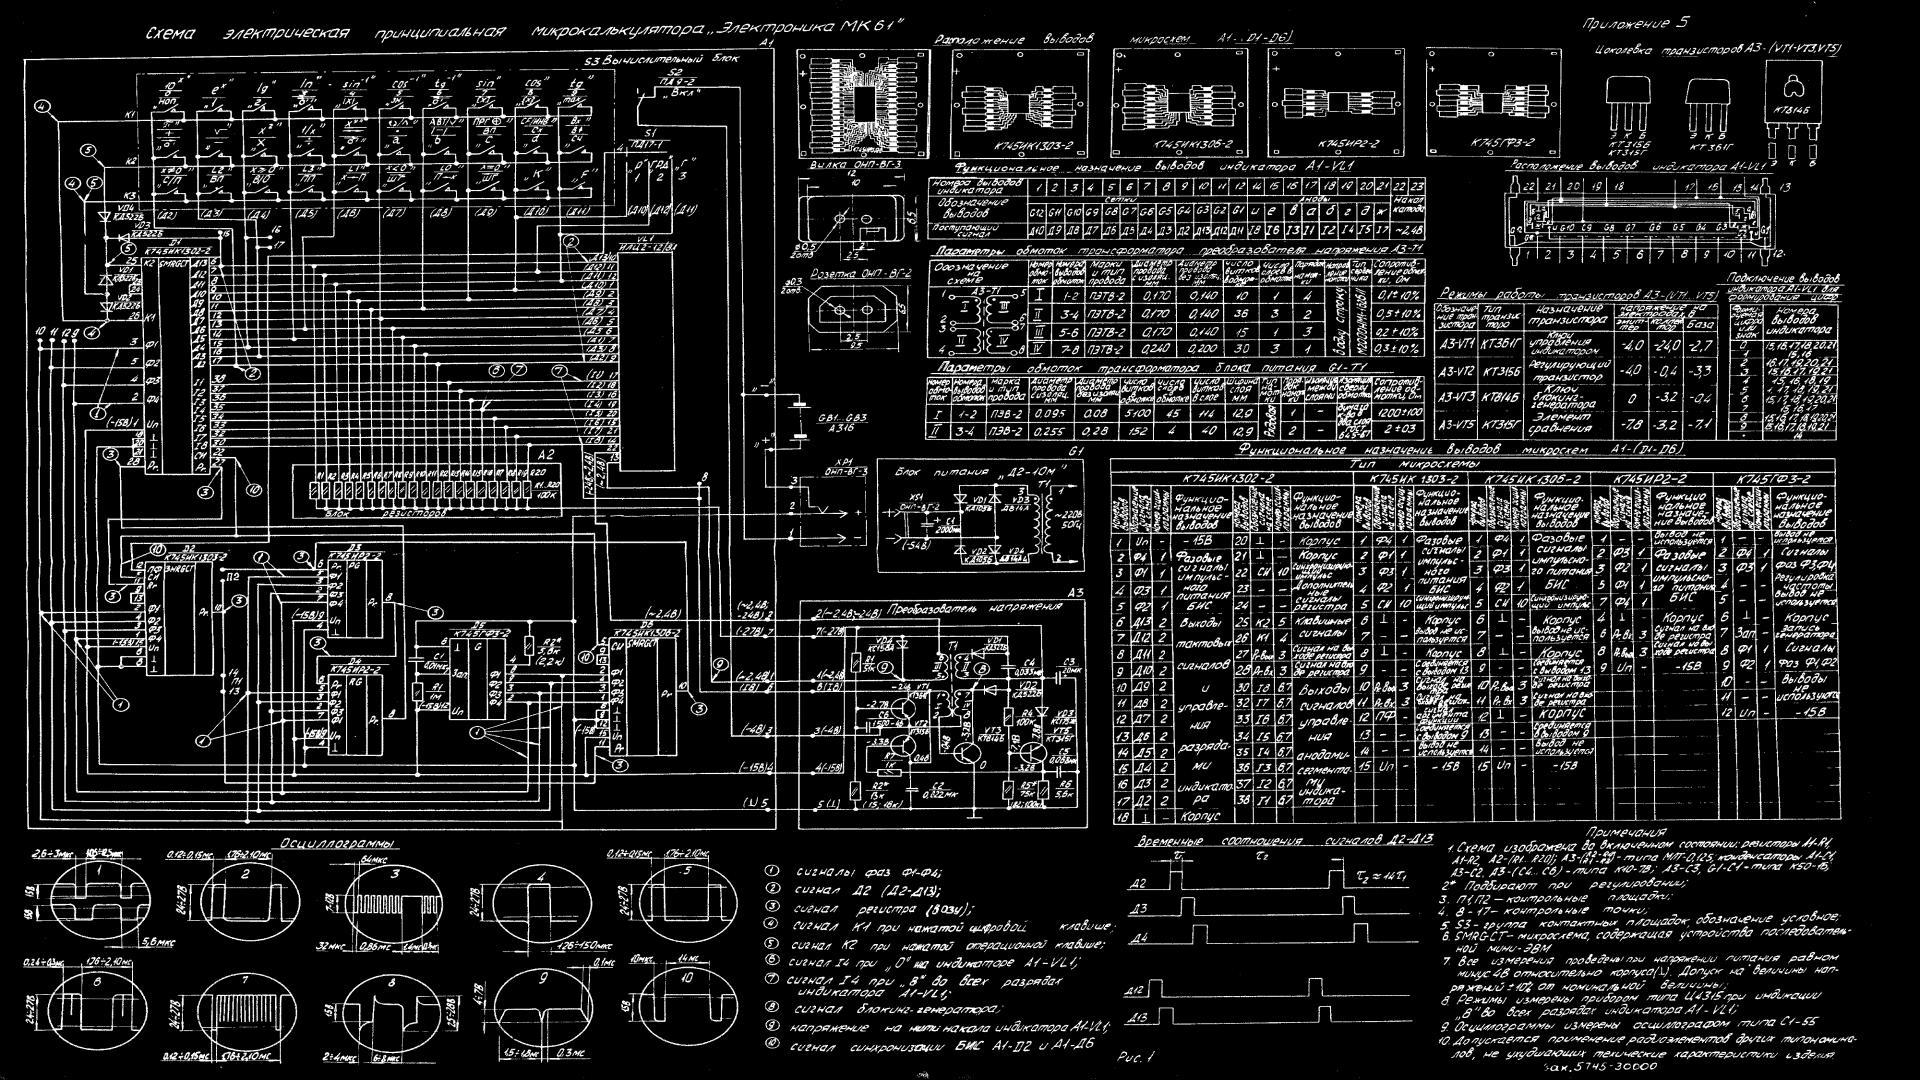 Schematic of a Russian MK-61 calculator Computer ...